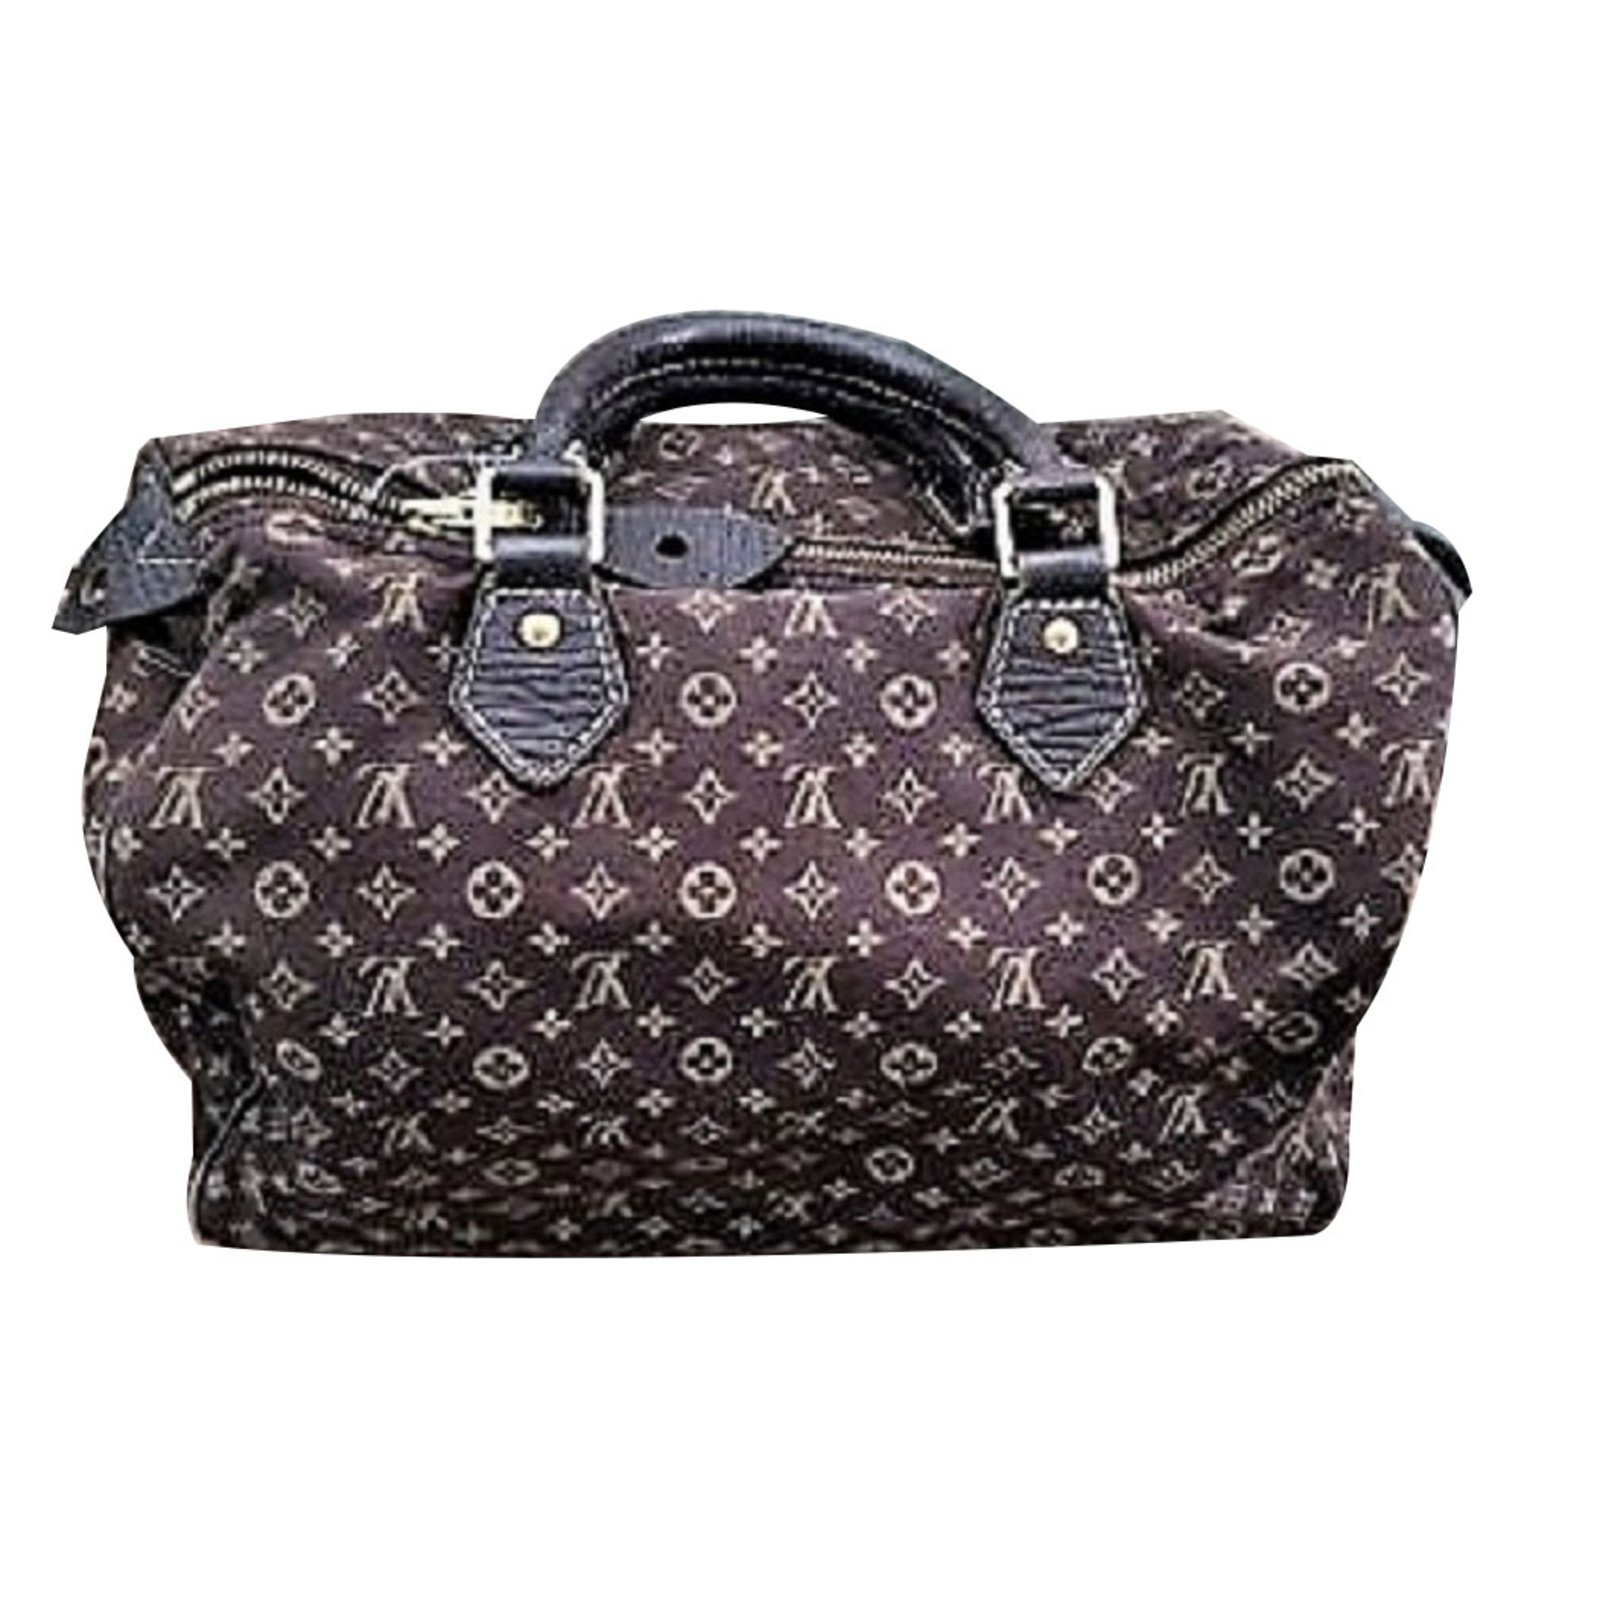 ec23b1bf6904 Louis Vuitton Speedy 30 Handbags Linen Dark red ref.73441 - Joli Closet